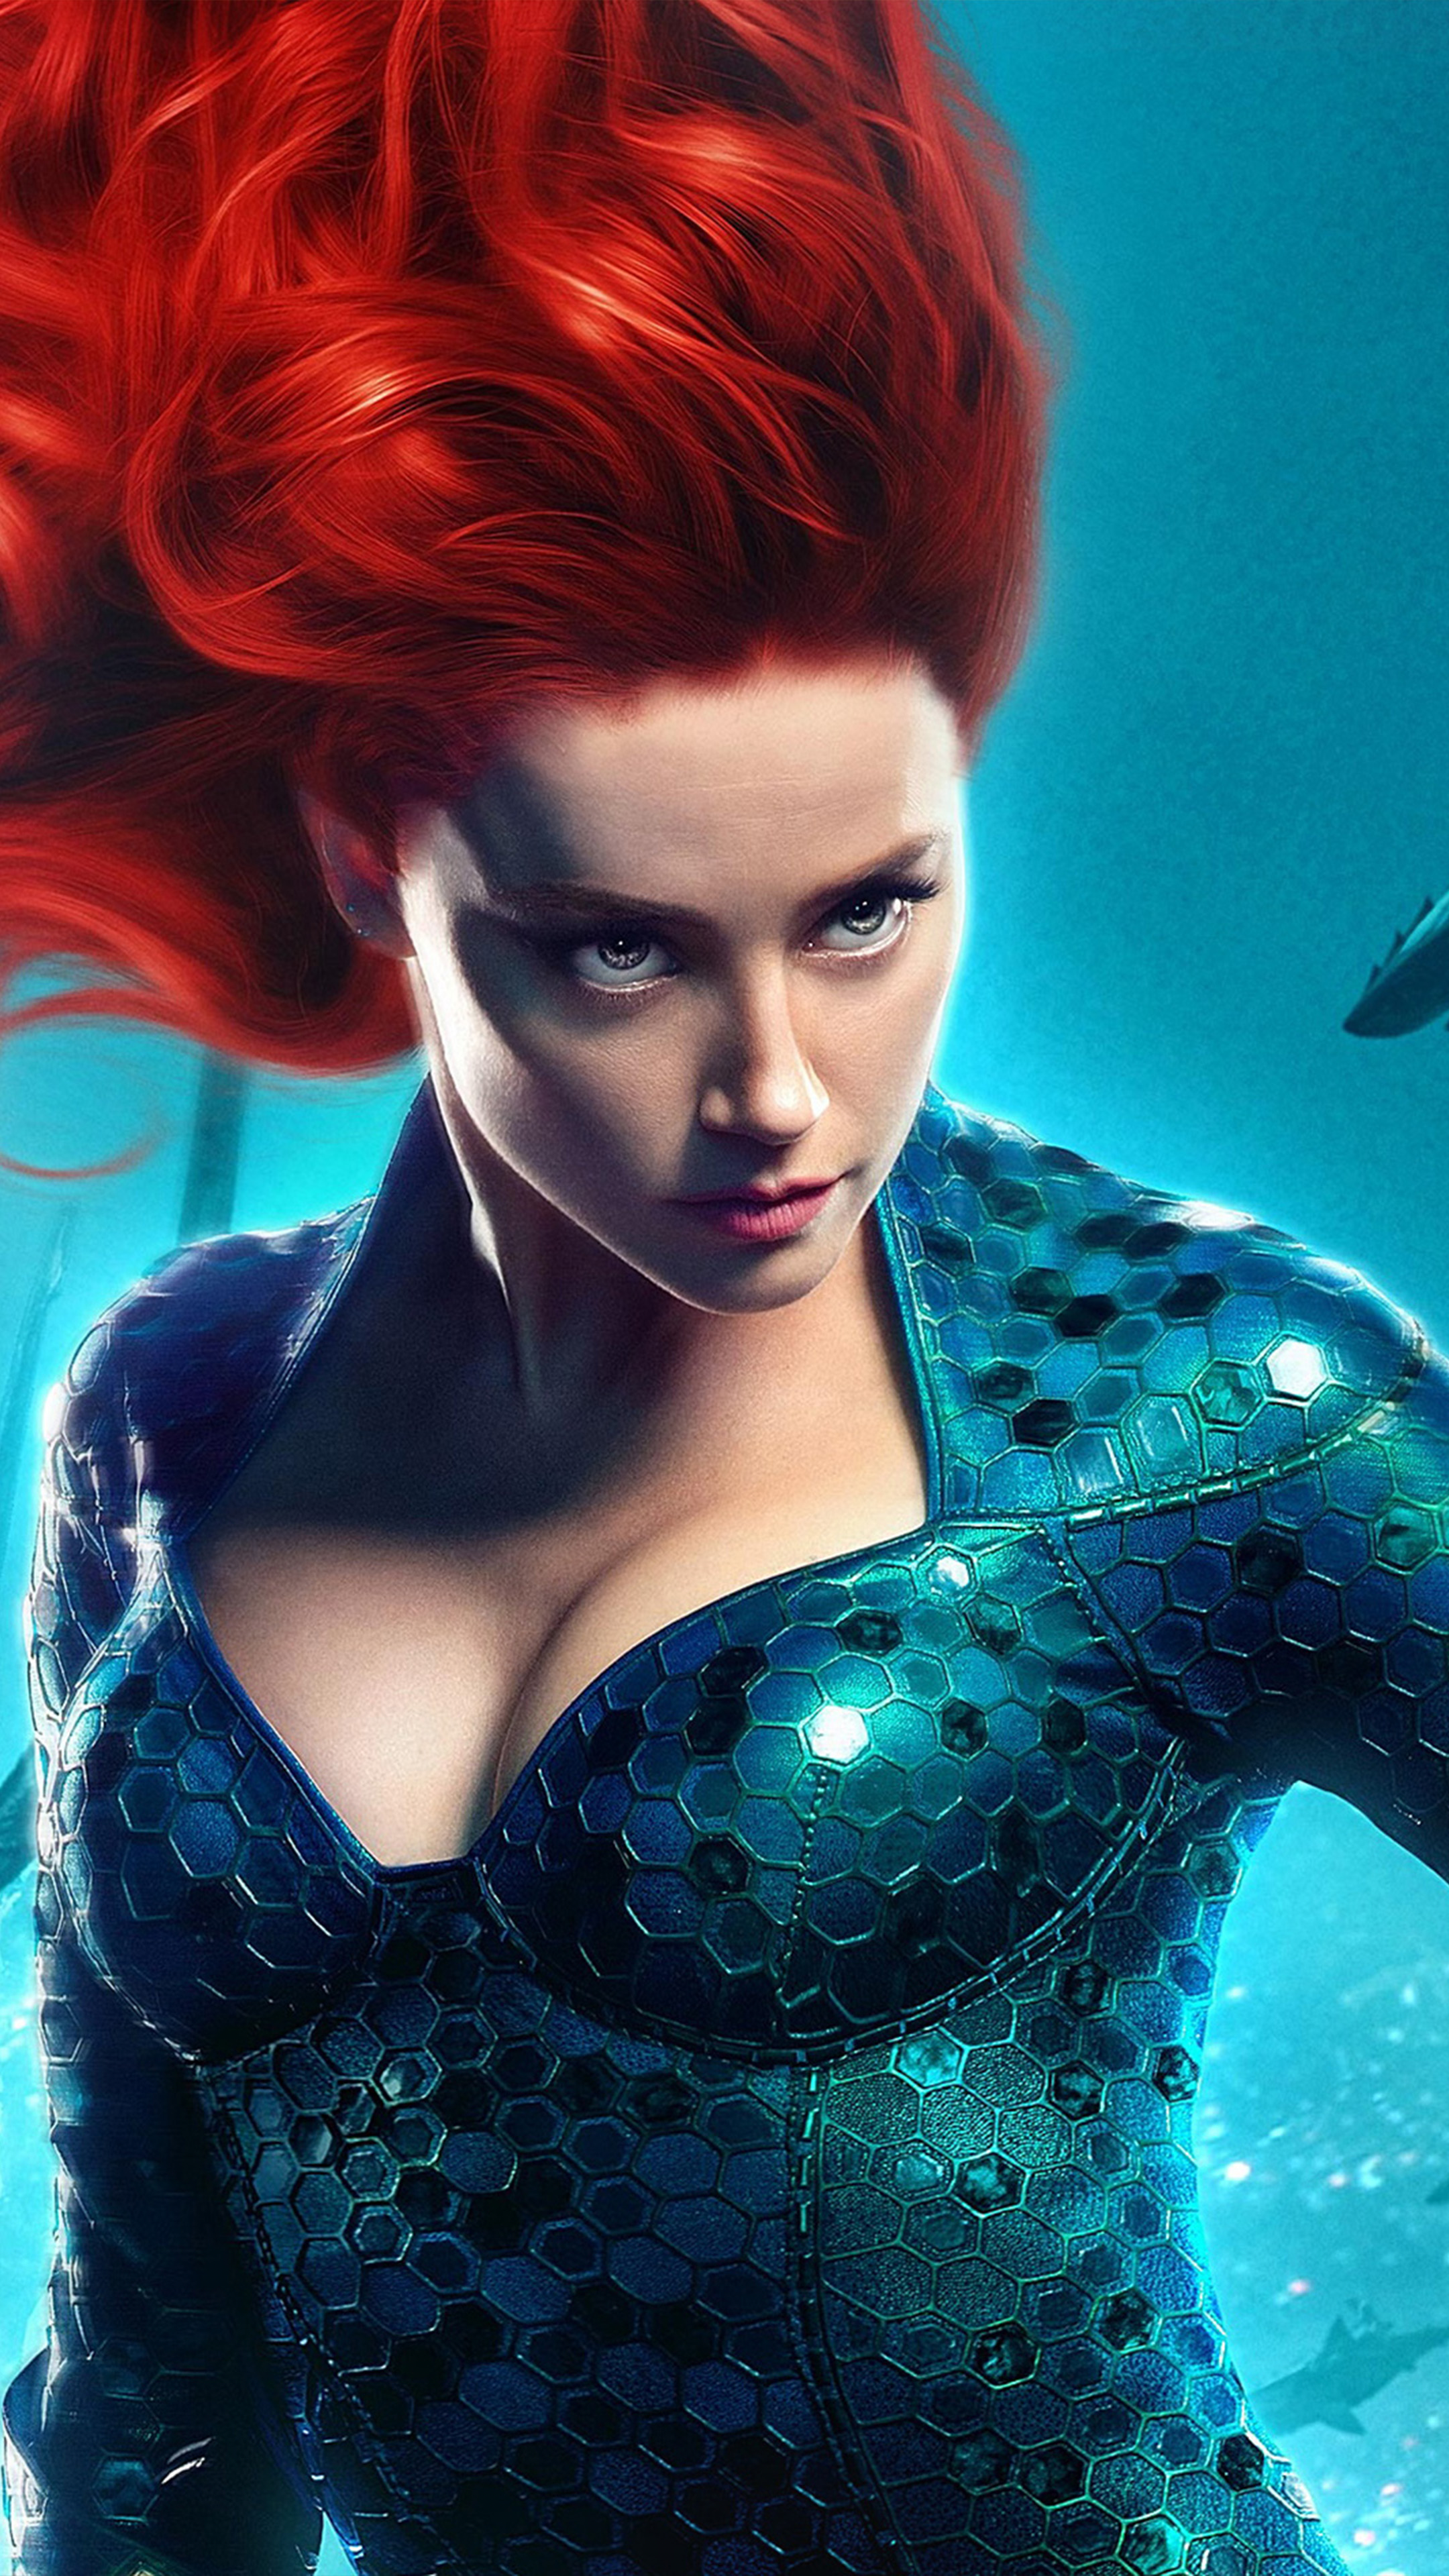 Download Amber Heard As Mera In Aquaman 2018 Free Pure 4k Ultra Hd